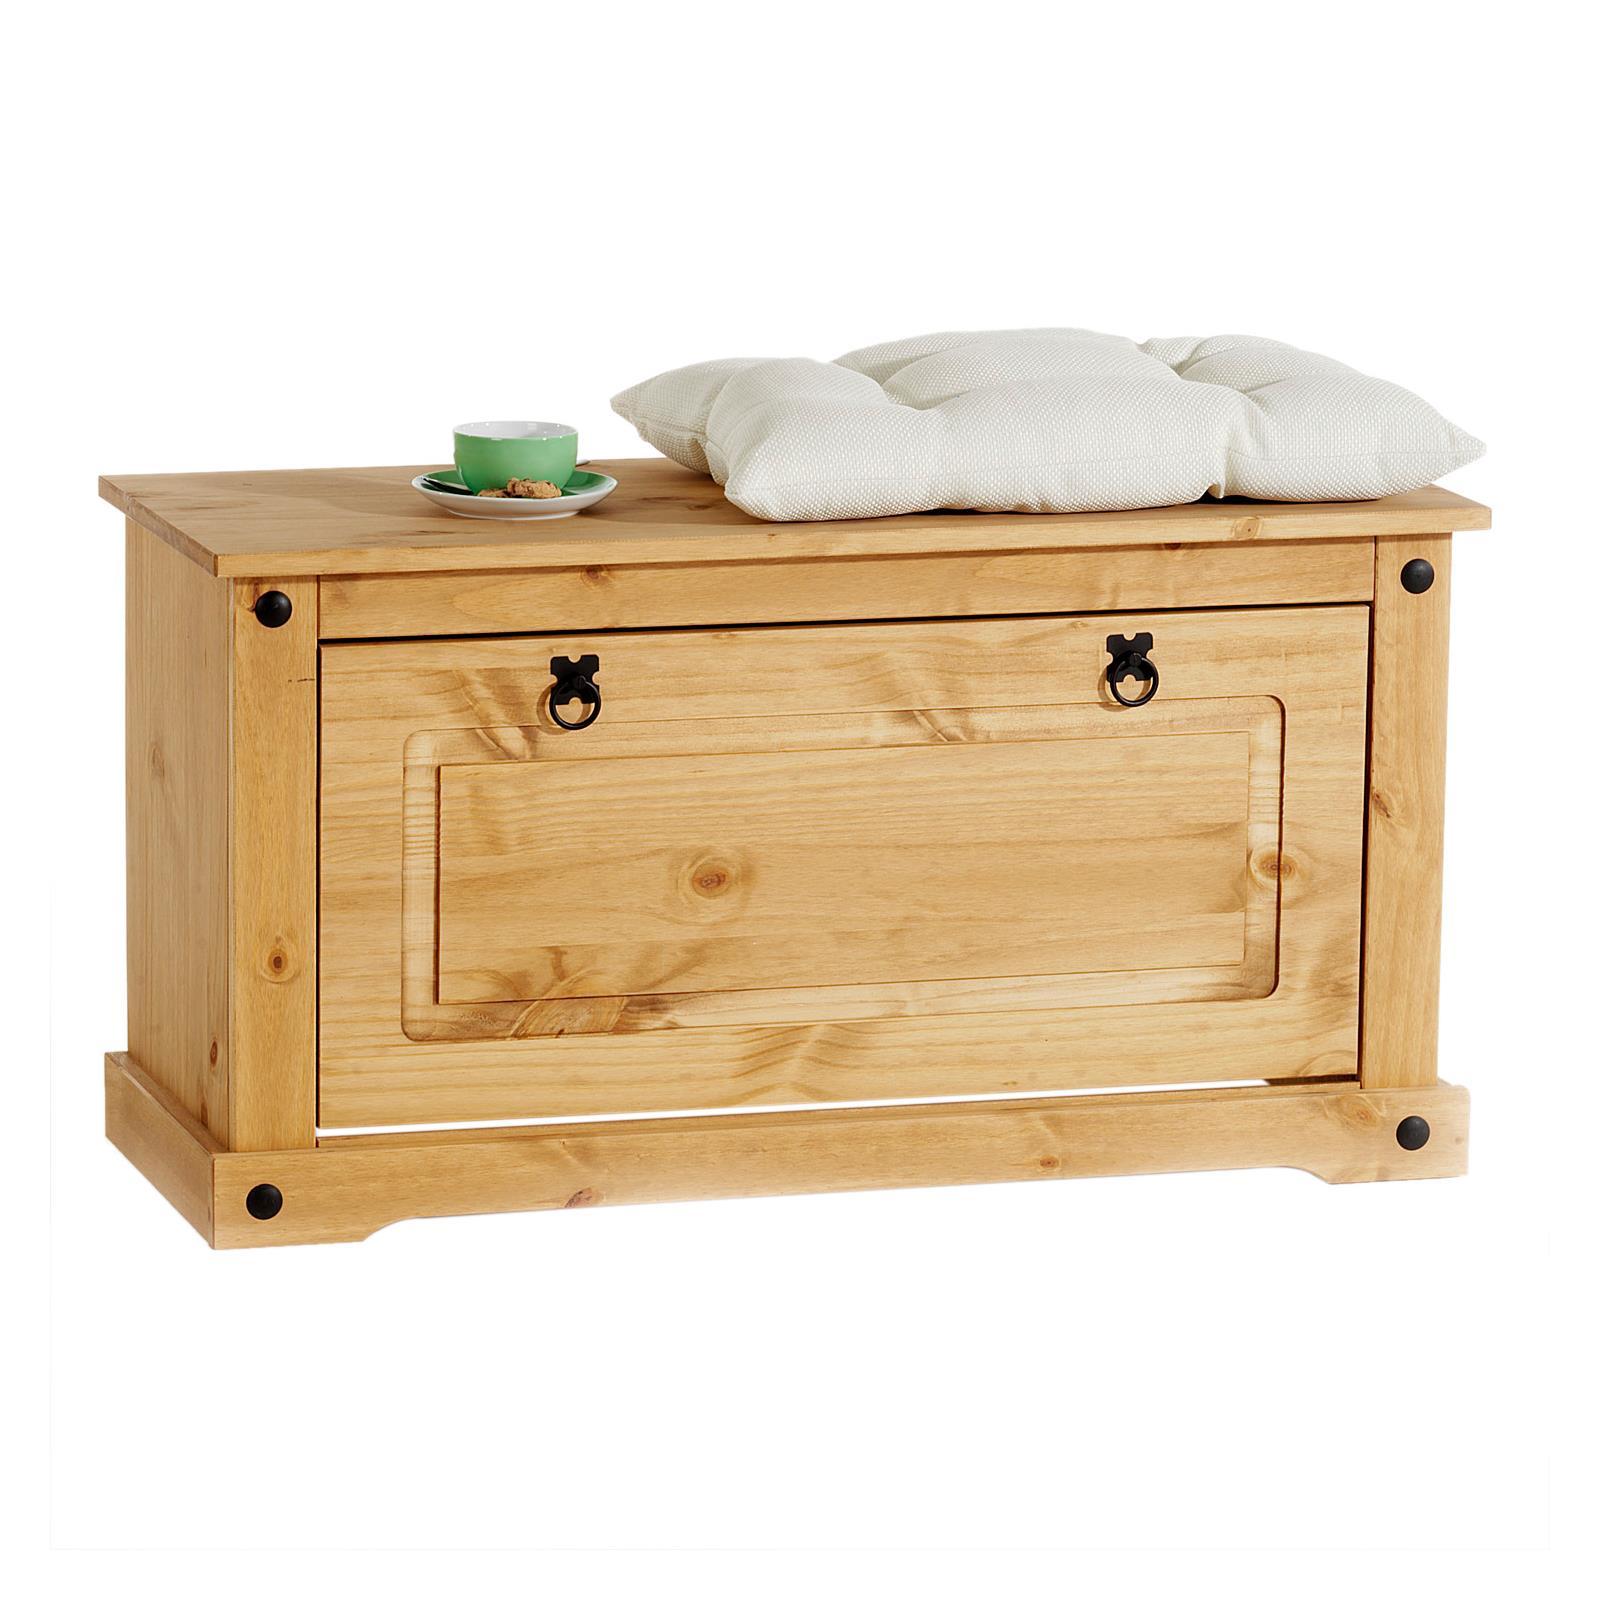 mexico m bel schuhbank tequila kiefer massiv mobilia24. Black Bedroom Furniture Sets. Home Design Ideas